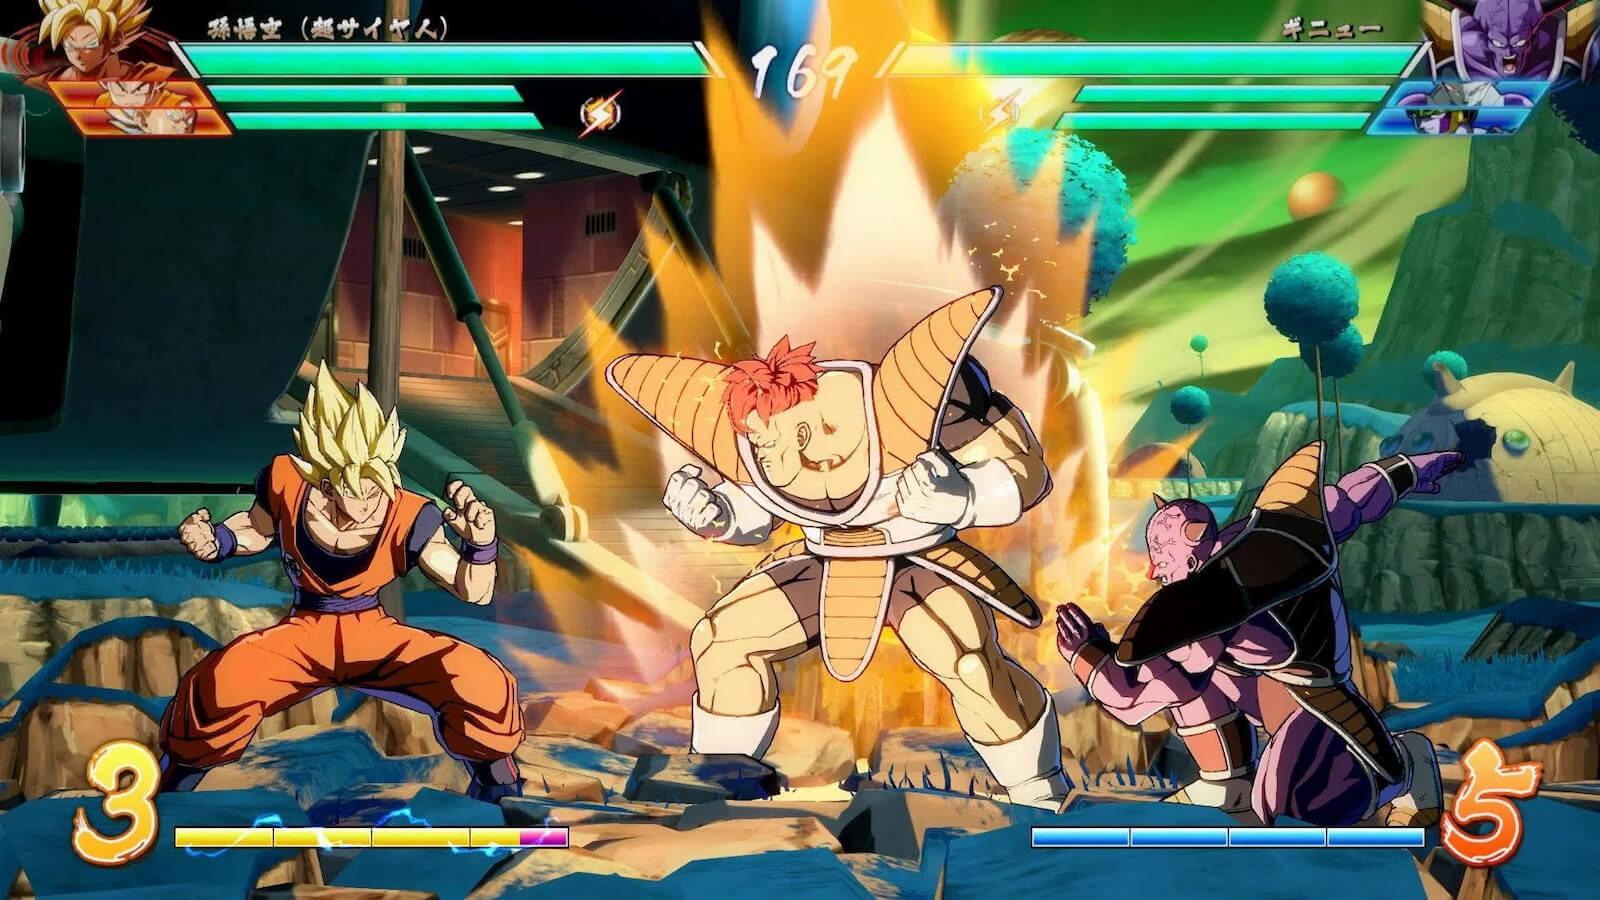 Dragon Ball FighterZ sistem gereksinimi